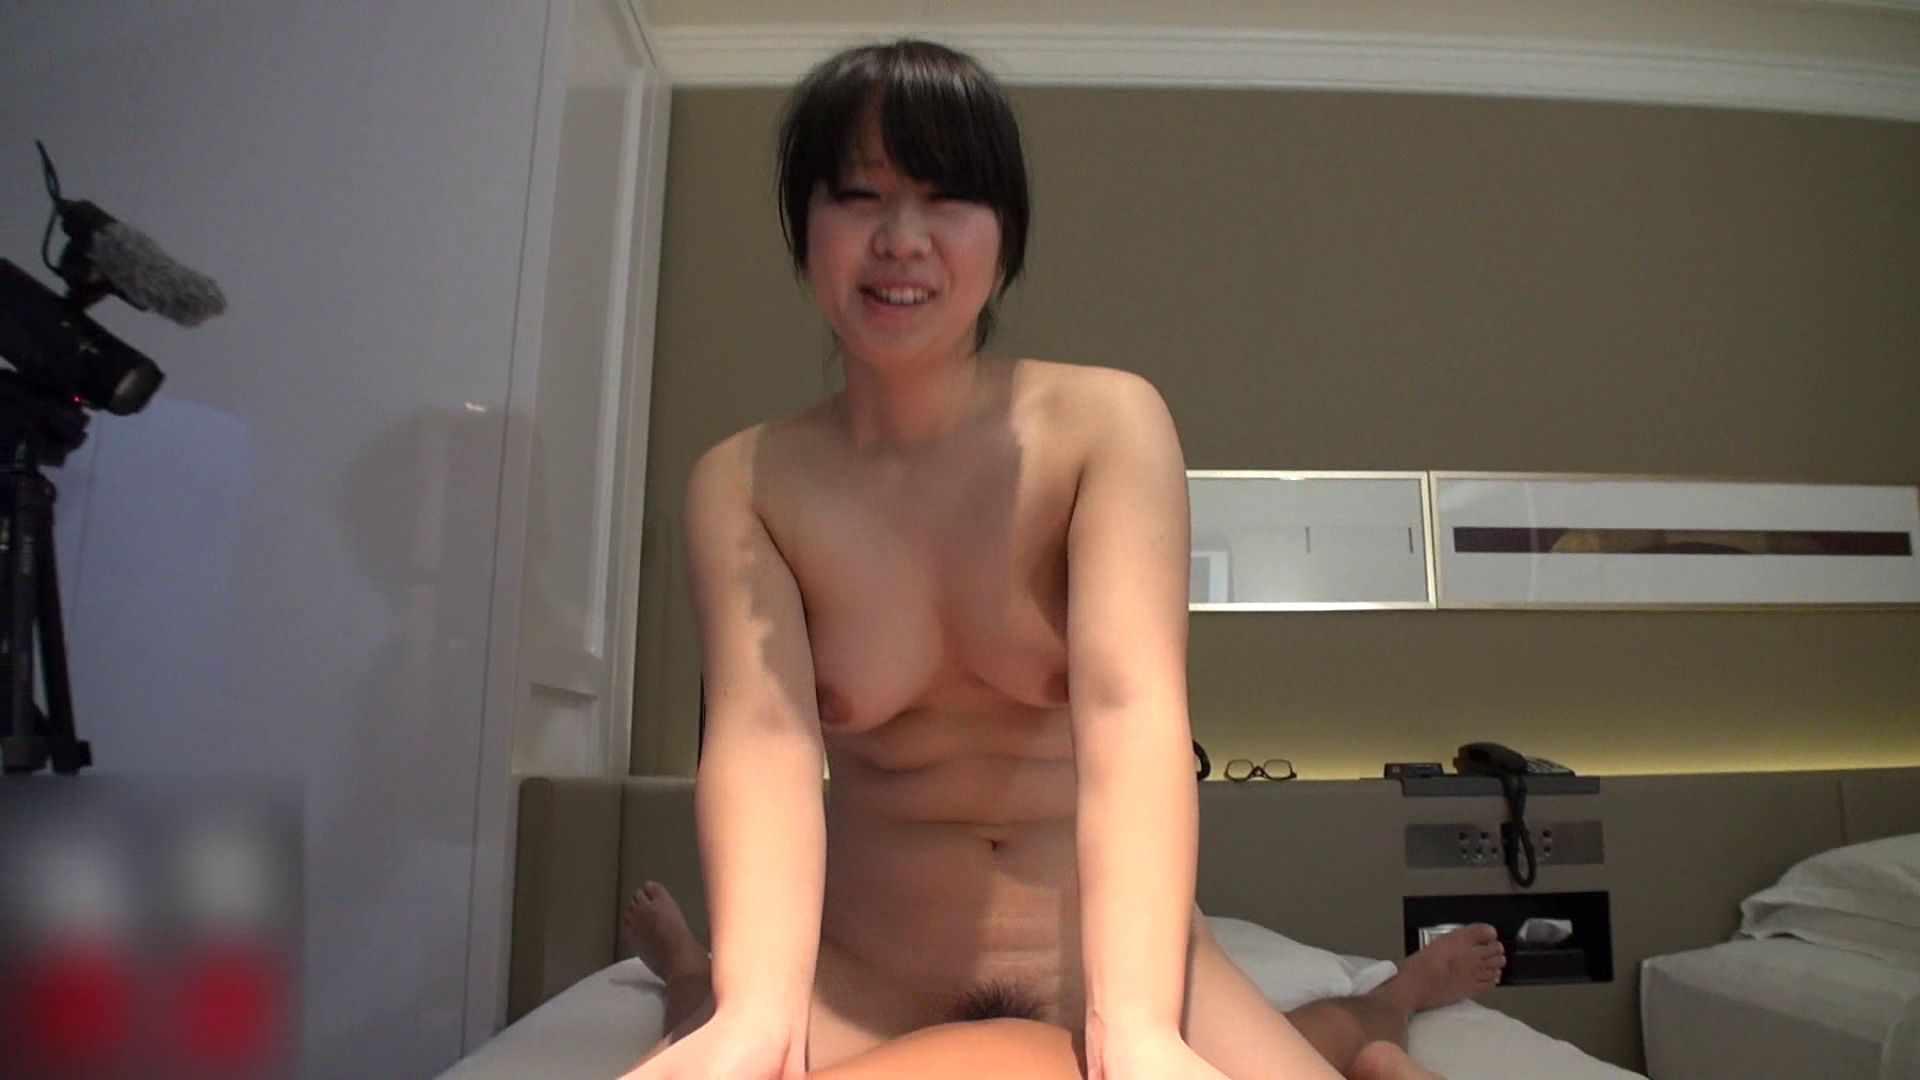 S級厳選美女ビッチガールVol.39 後編 エッチなセックス  102画像 78